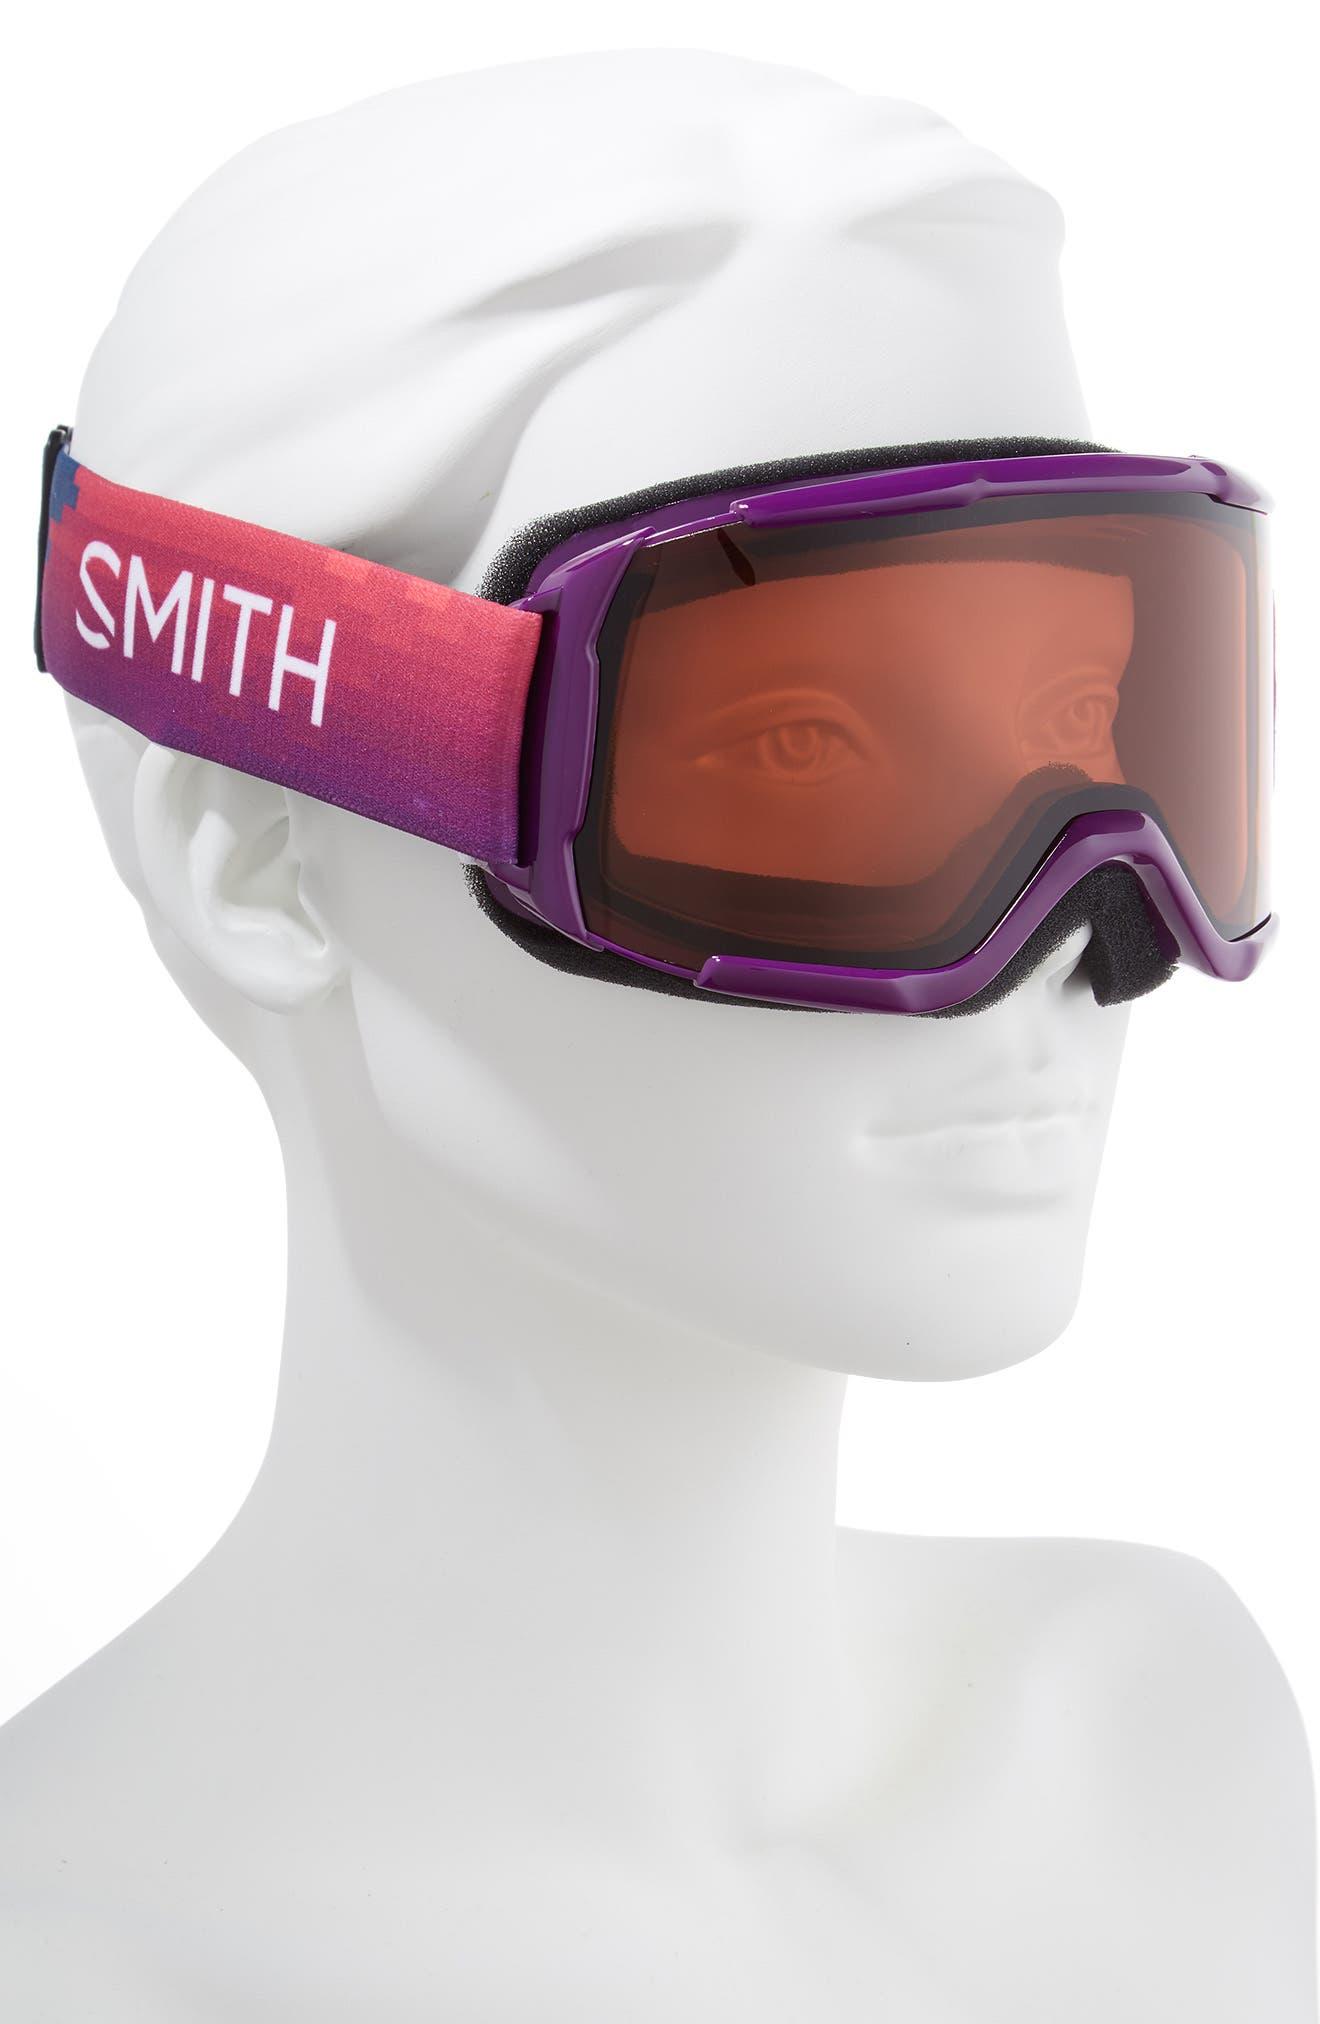 Daredevil 170mm Snow Goggles,                             Alternate thumbnail 2, color,                             MONARCH RESET